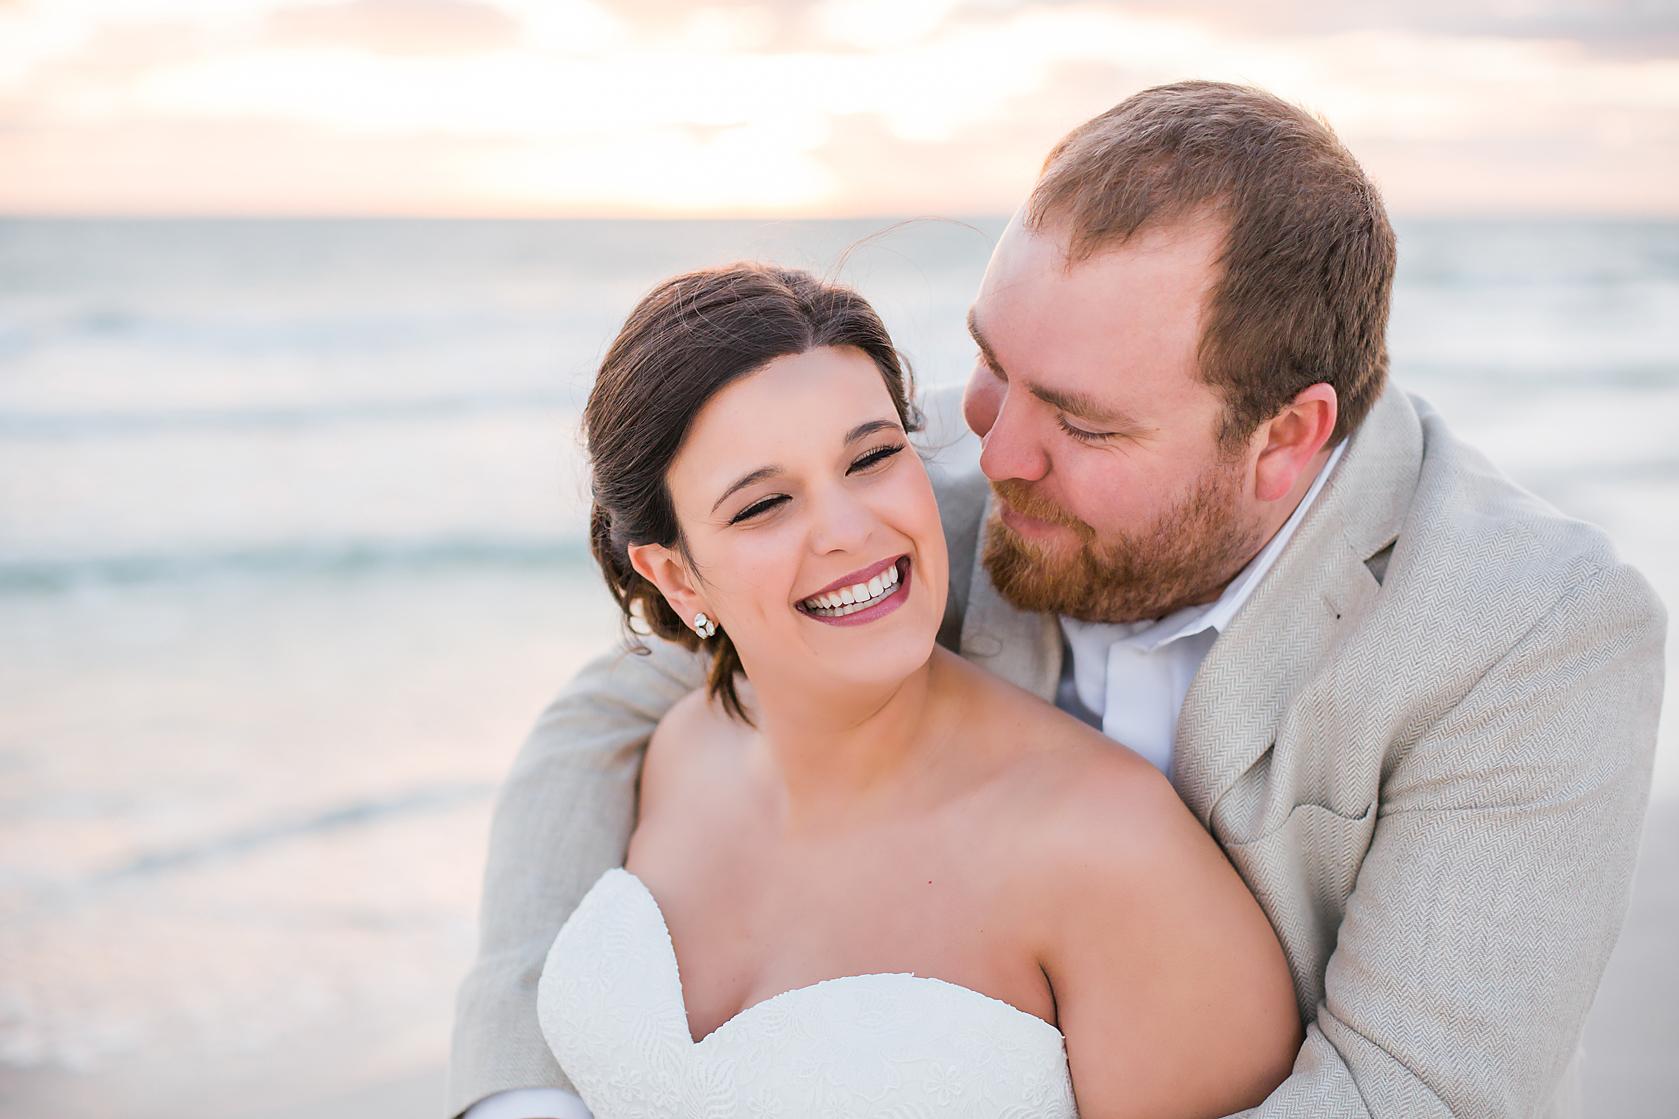 Bailey + Chalin - Anna Maria Island Wedding Photographer - Destination Wedding Photography - Emily & Co. Photography - Beach Wedding Photography 191.jpg